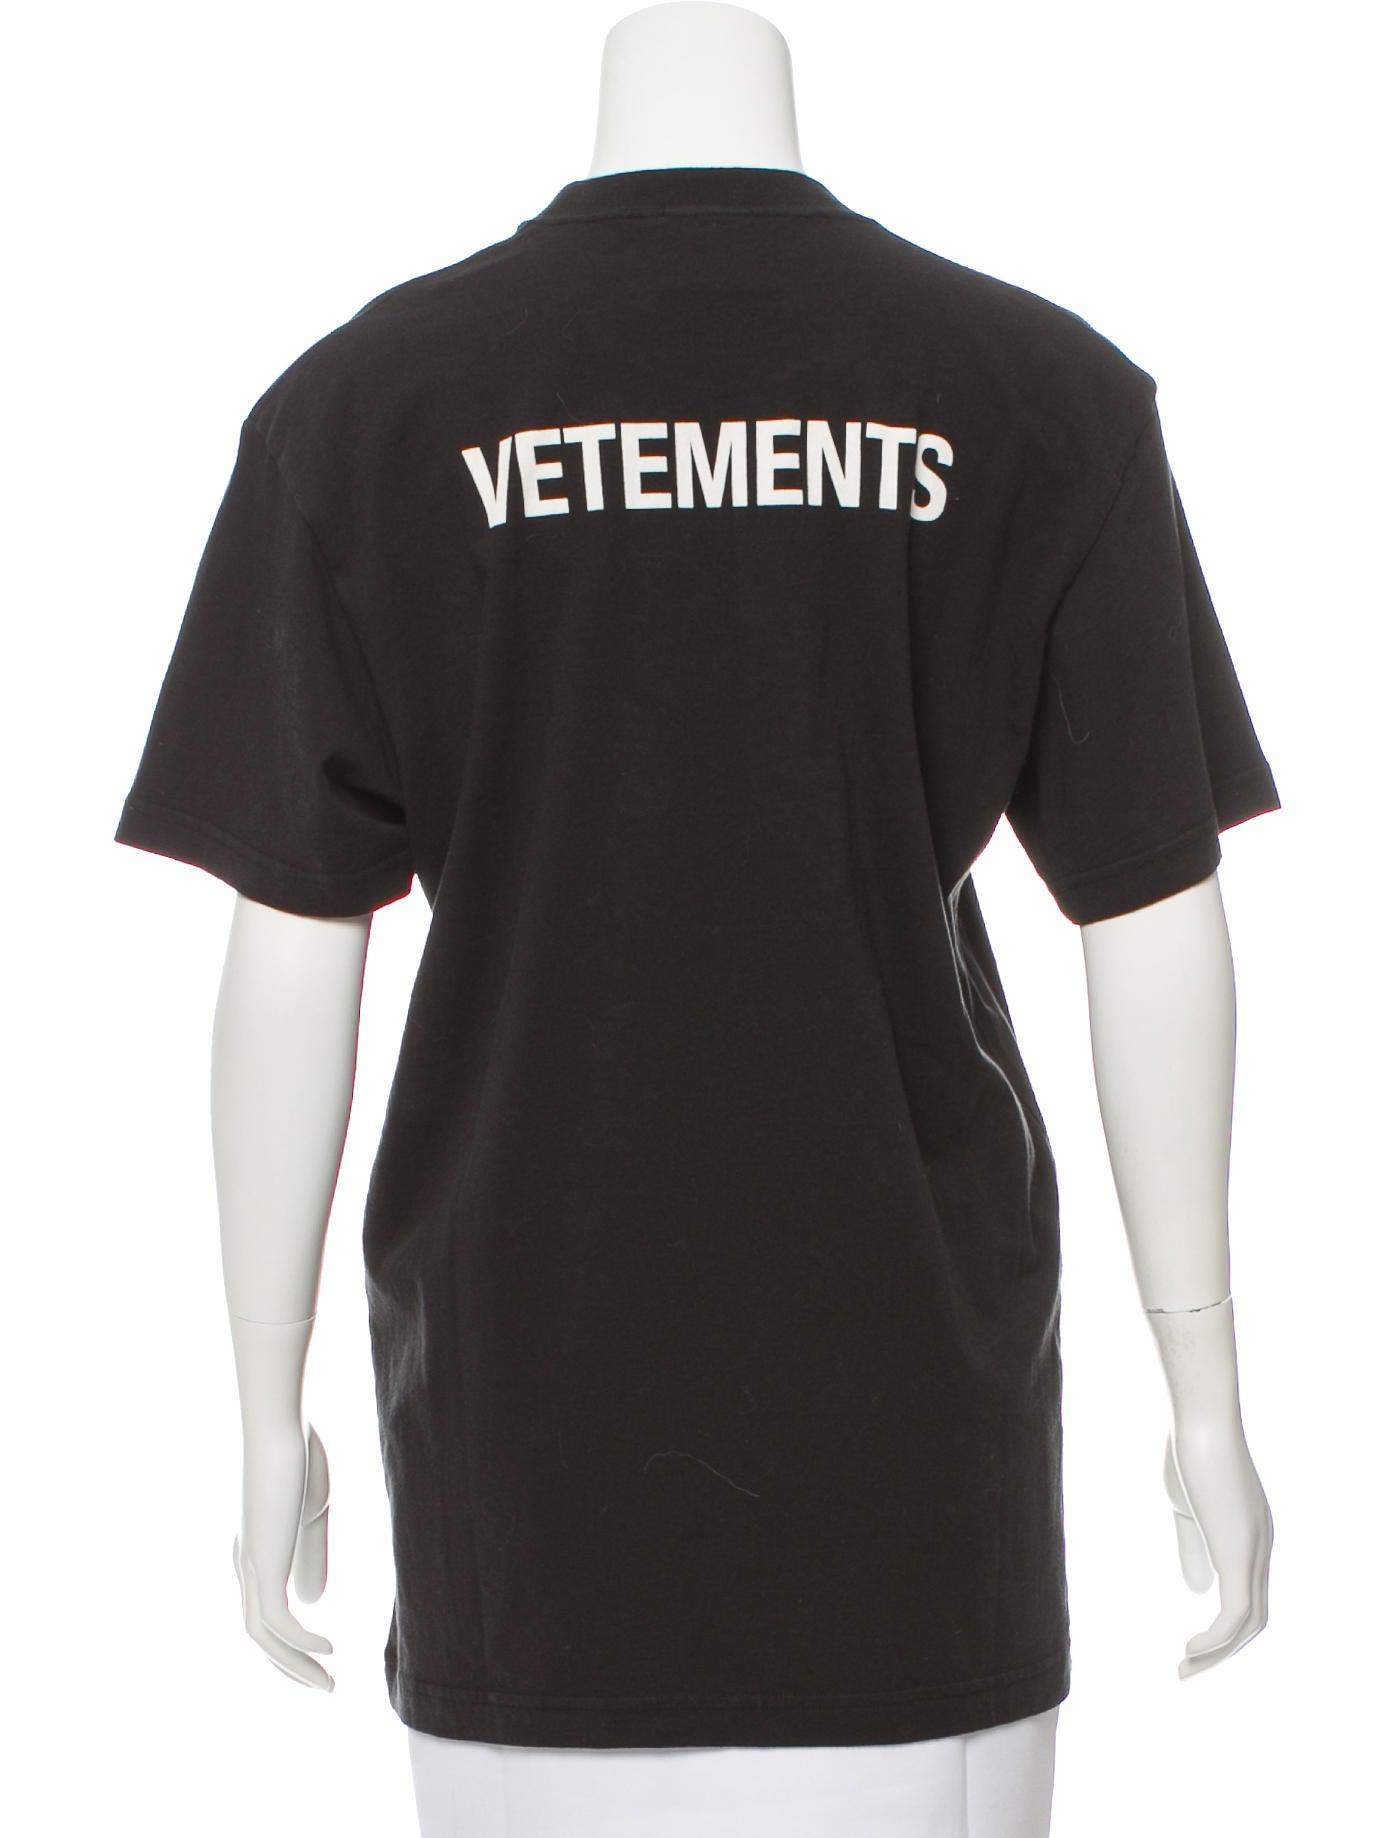 Vetements 2016 staff t shirt w tags clothing vtm20543 for Vetements basic staff t shirt